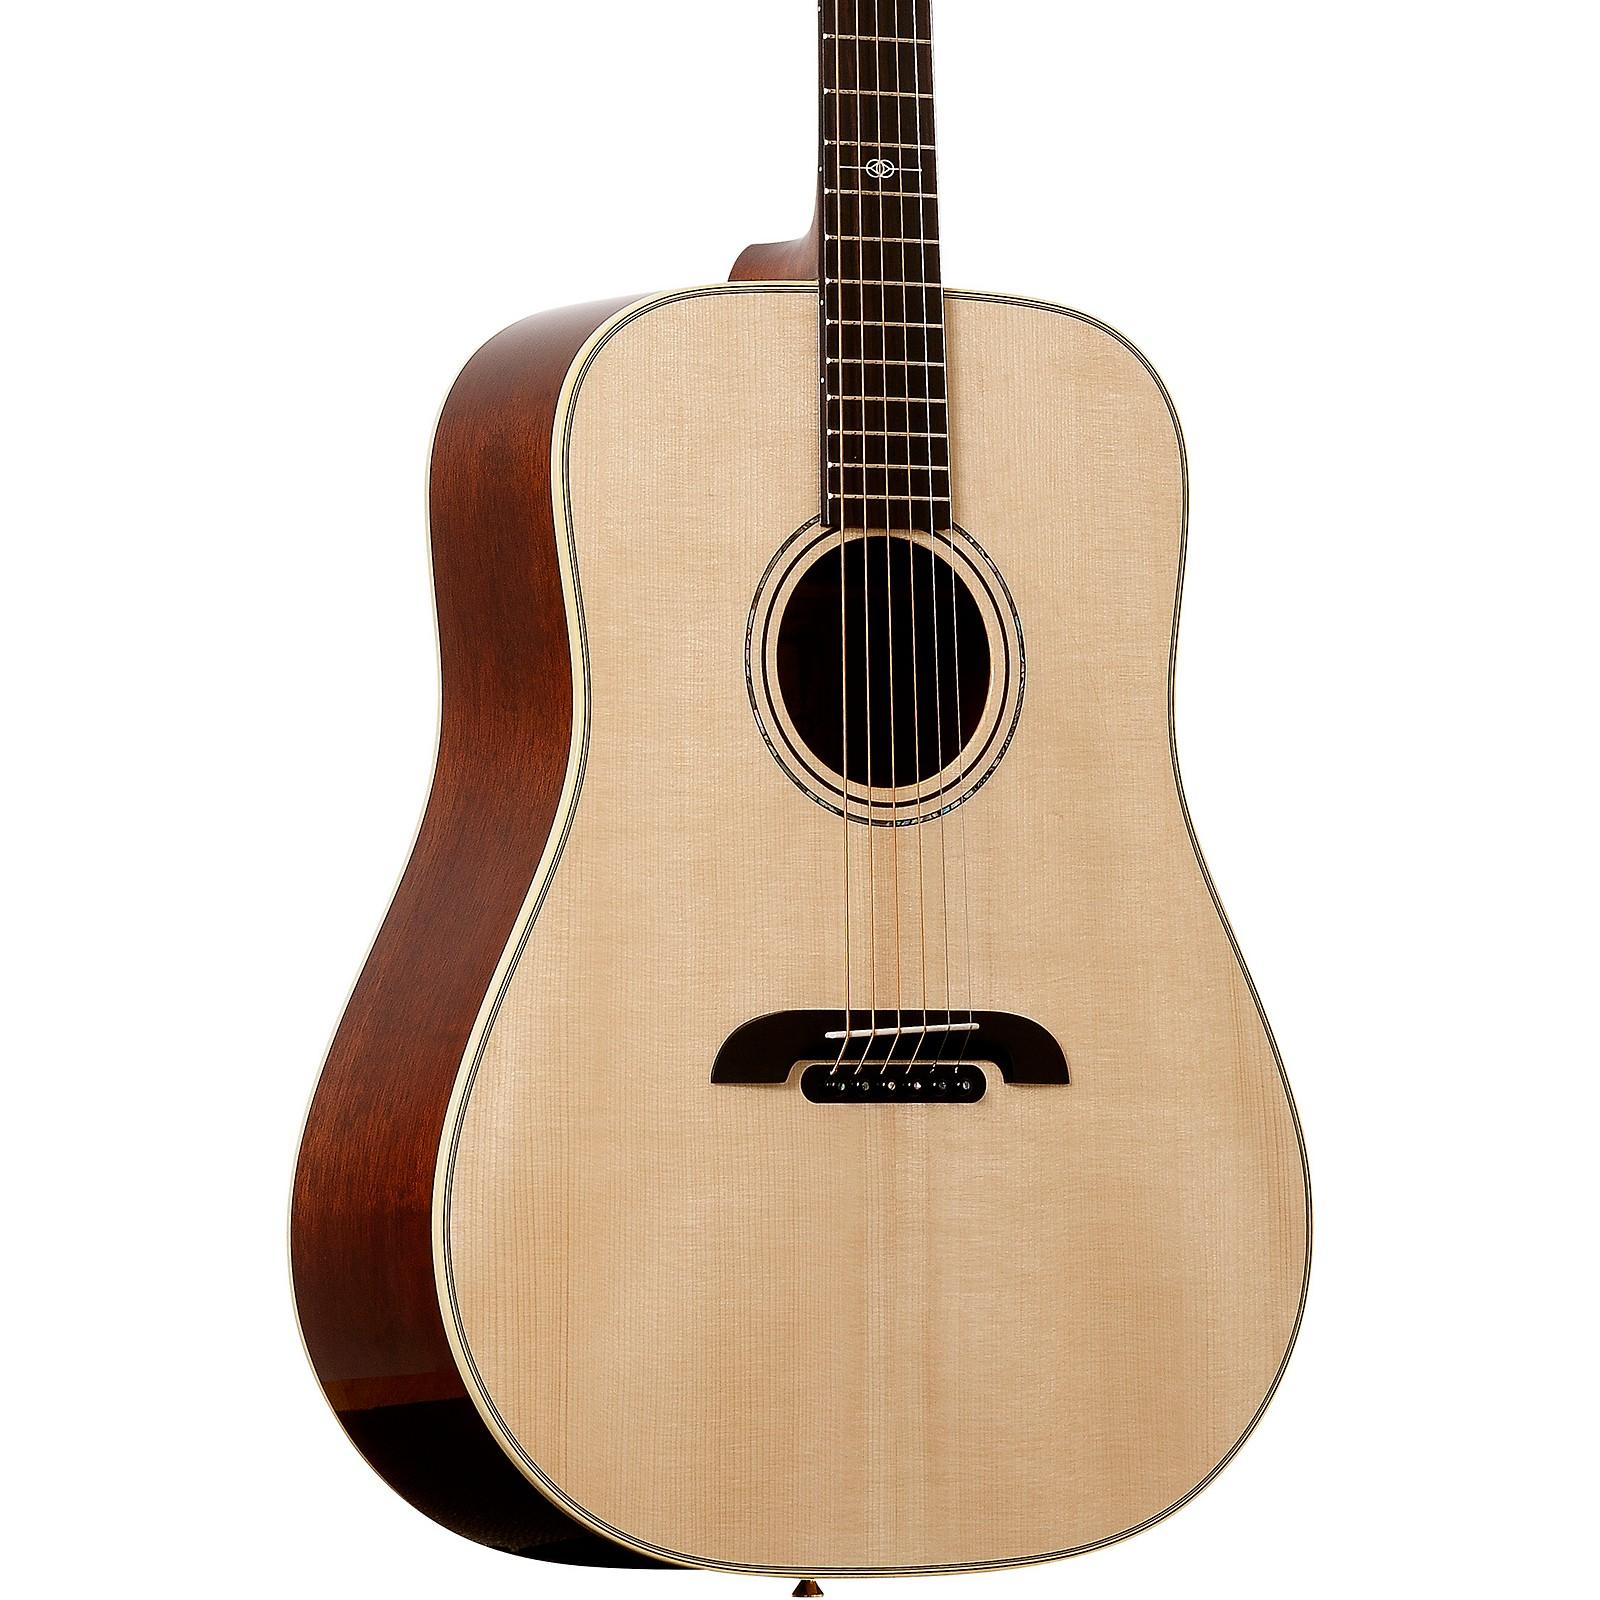 Alvarez Yairi DYM60HD Masterworks Dreadnought Adirondack Acoustic Guitar